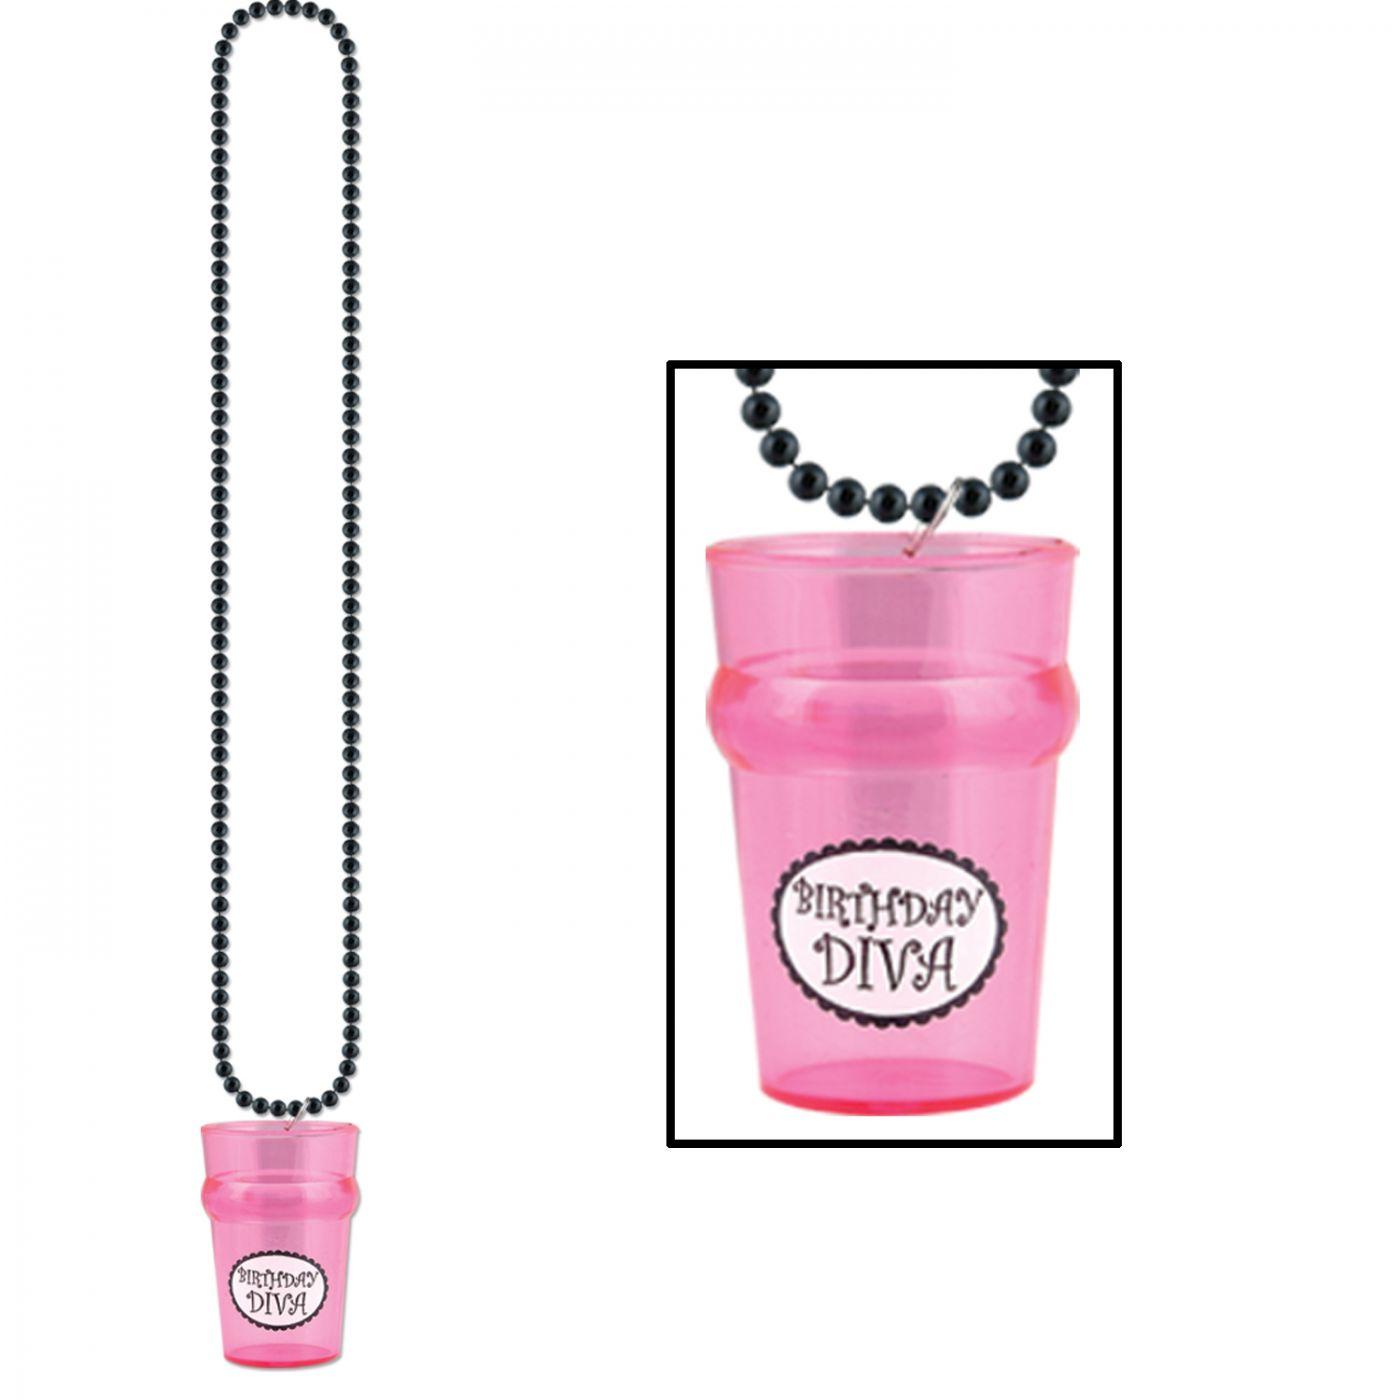 Beads w/Birthday Diva Glass image